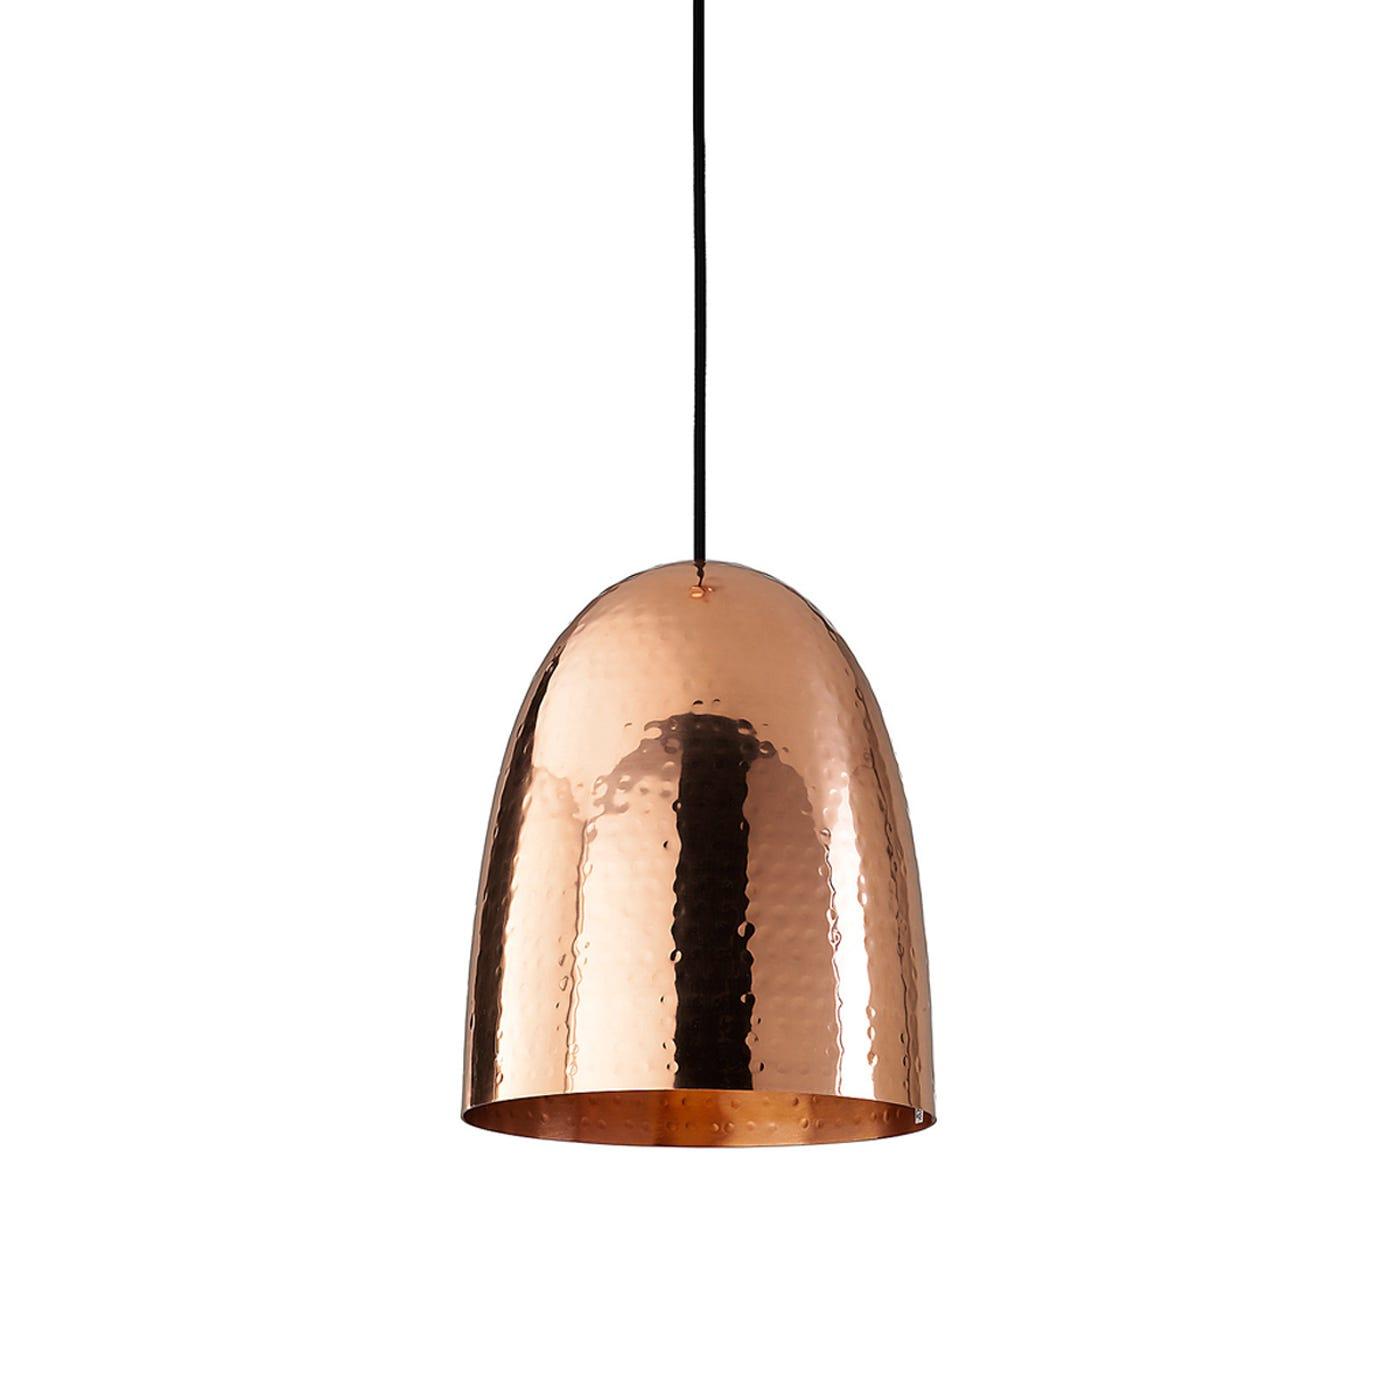 Stanley Hammered Pendant Large Copper